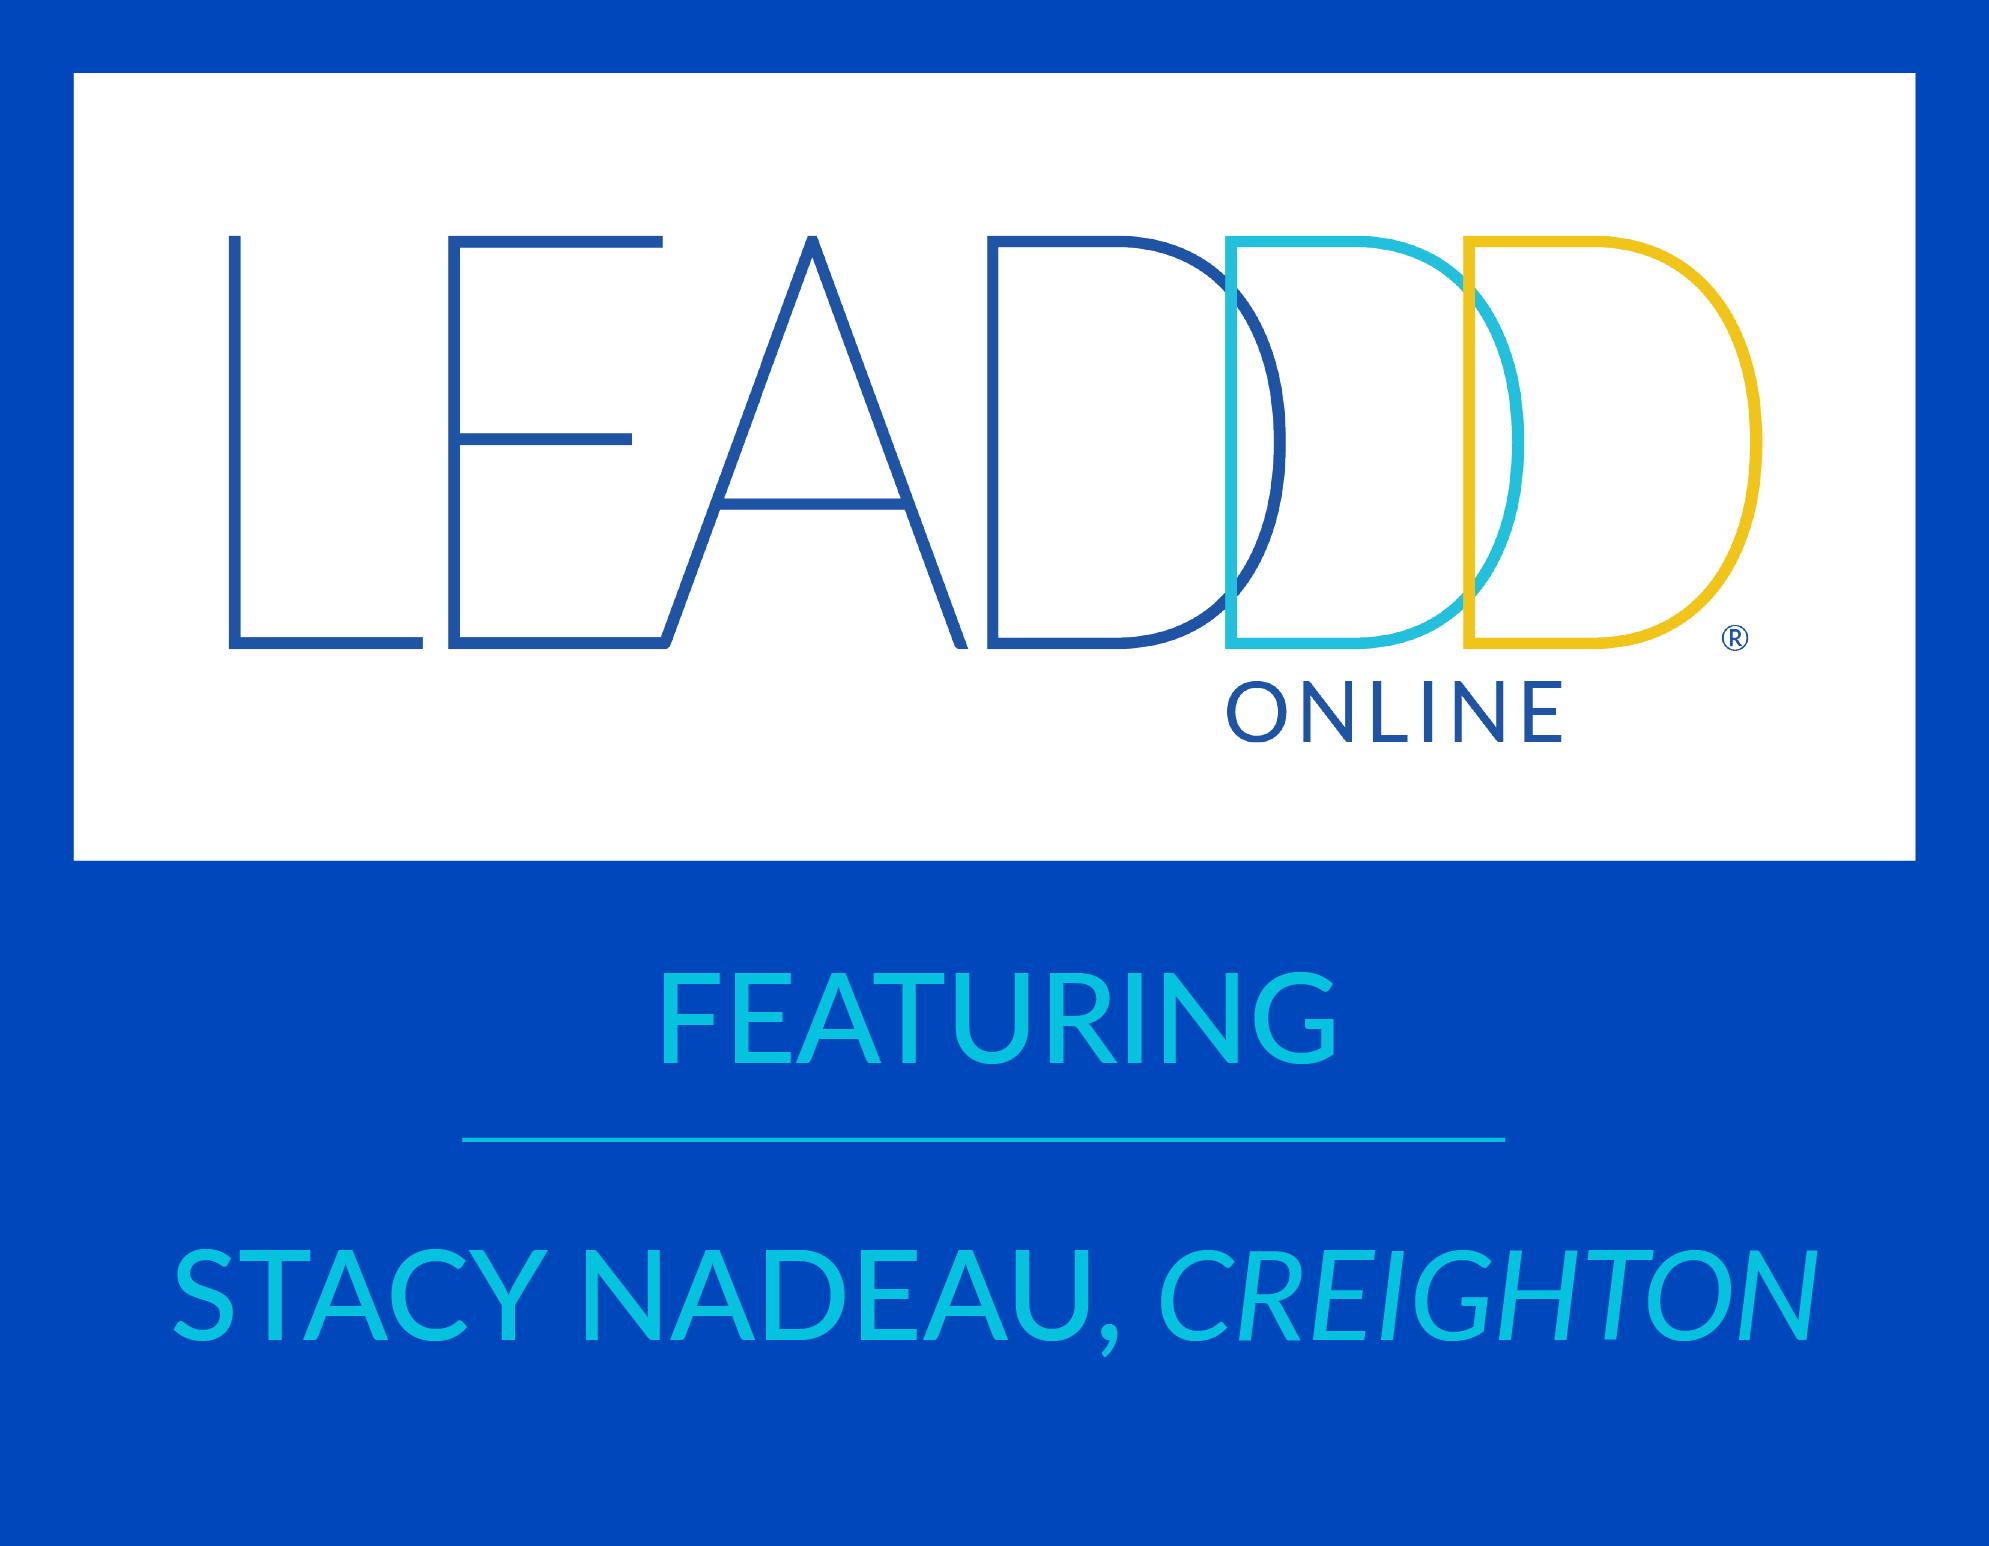 LEADDD U featuring Stacy Nadeau, Creighton